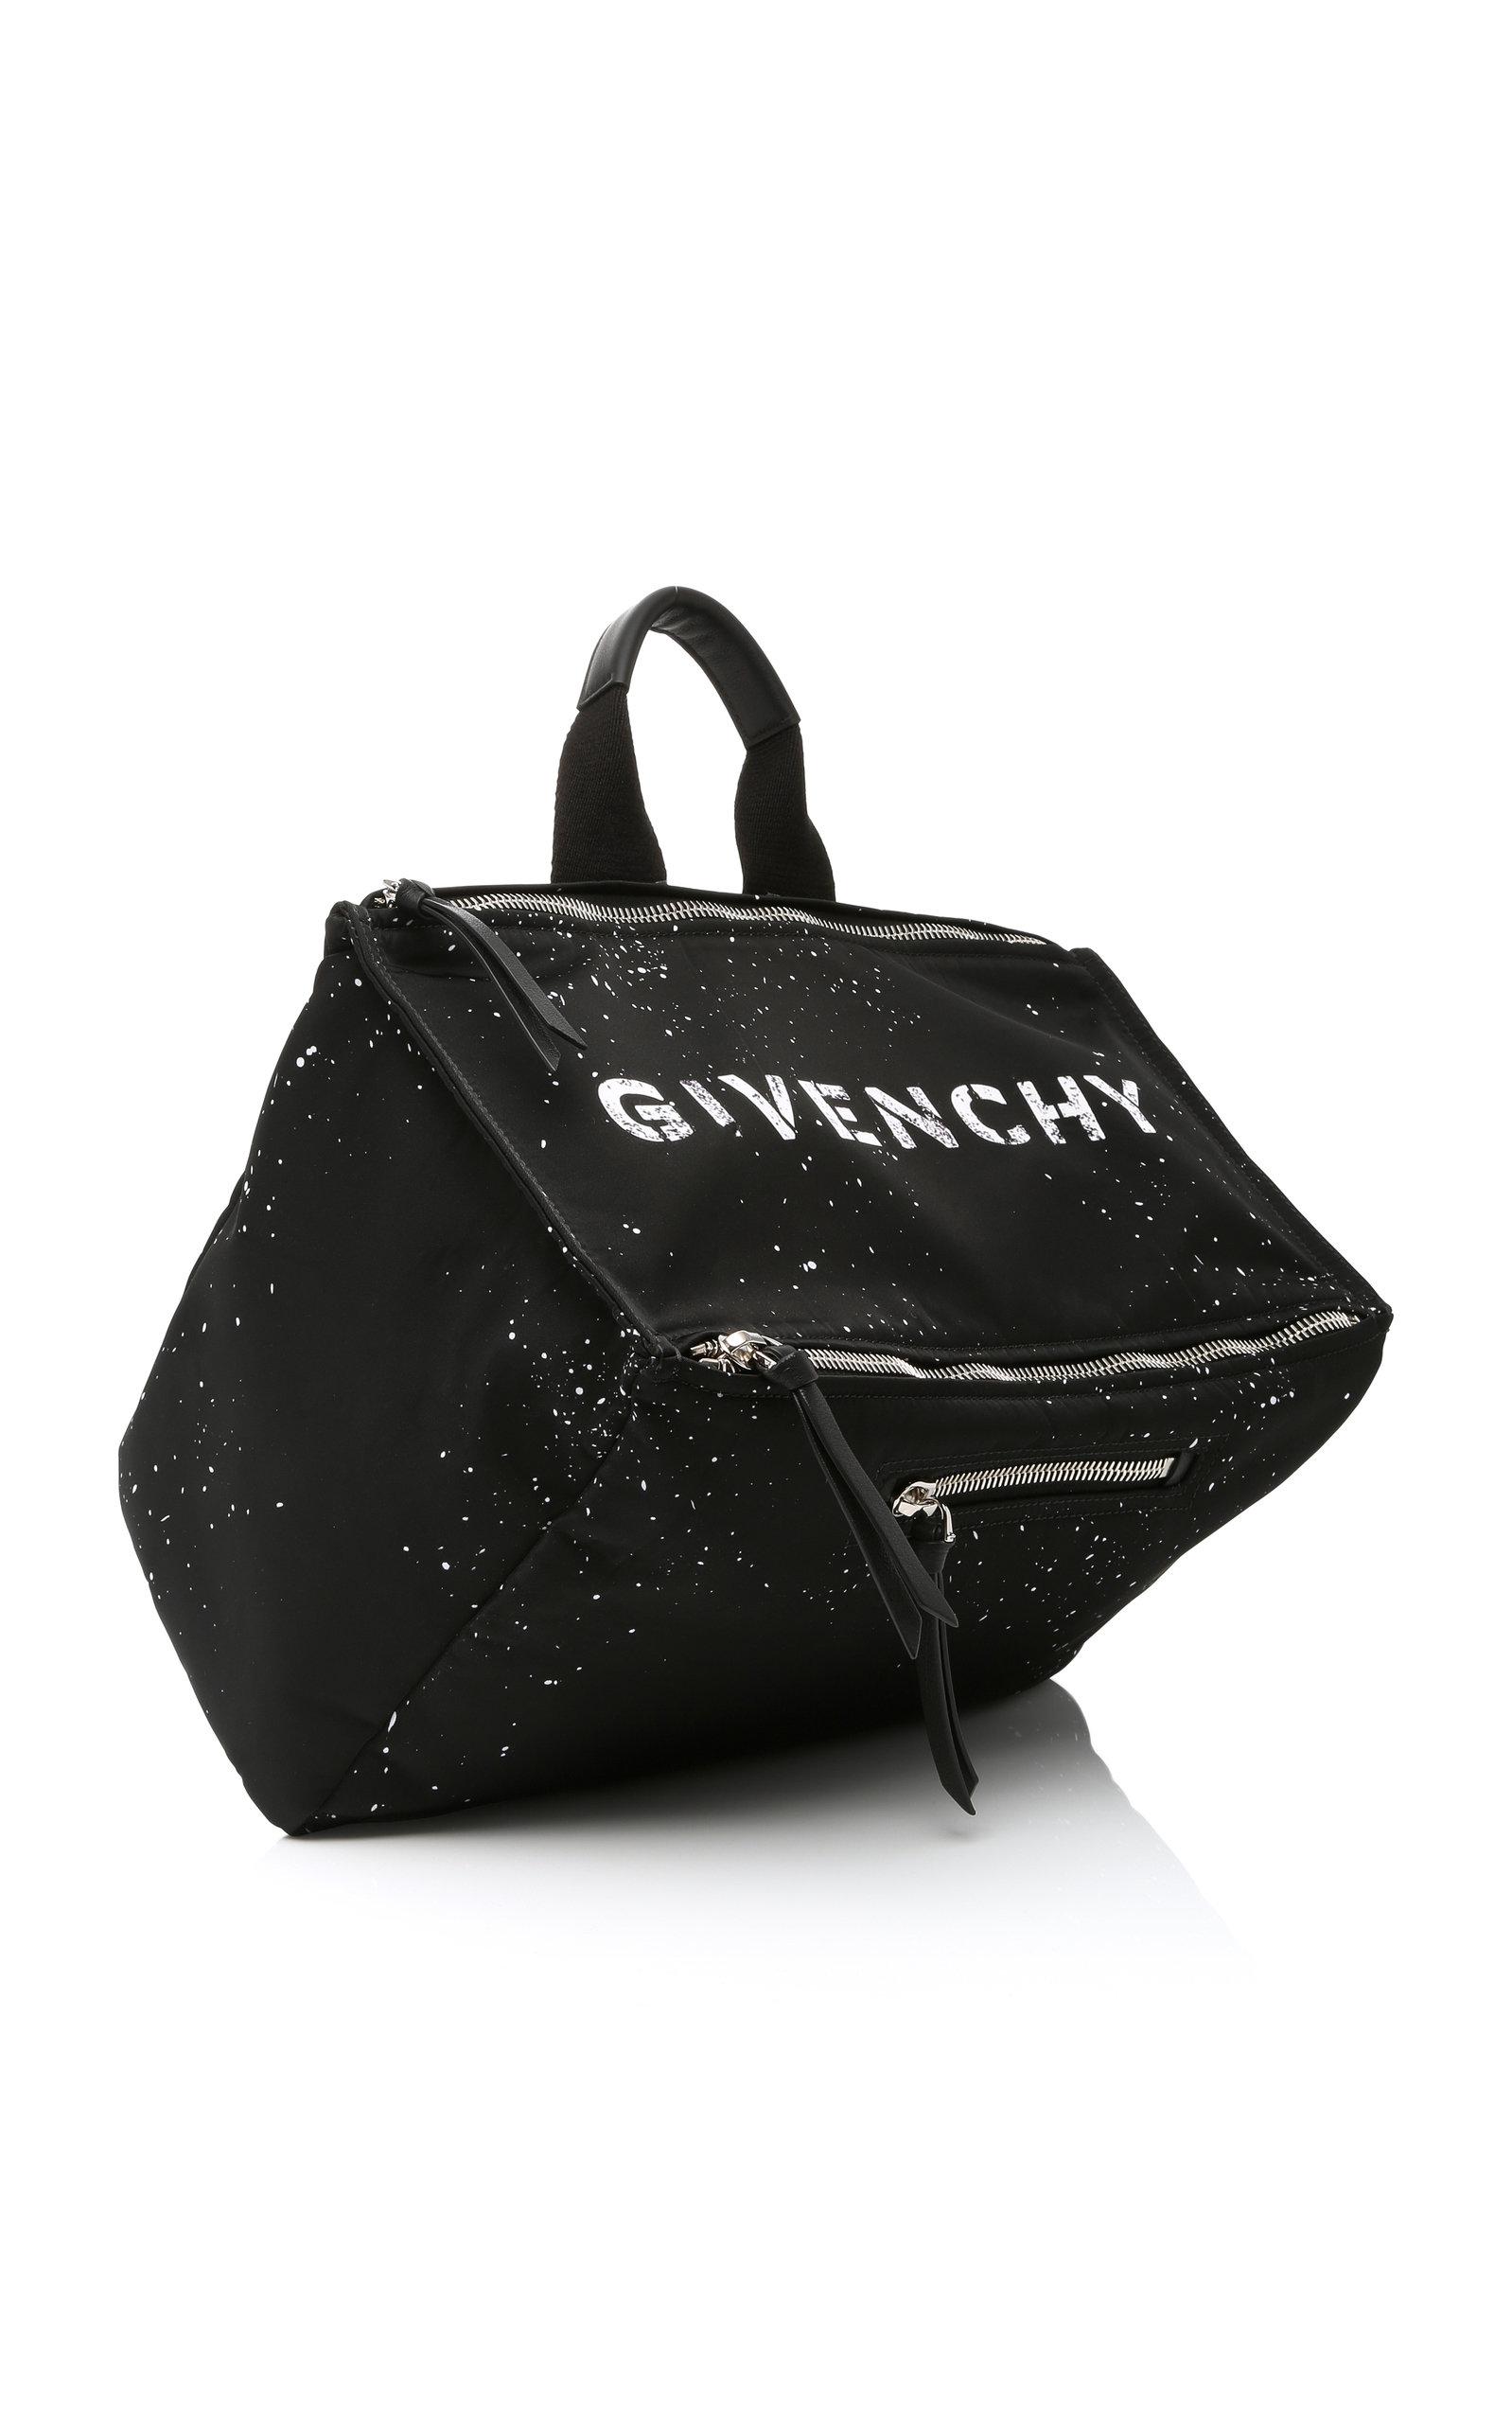 Givenchy Pandora Messenger Bag In Black  f51221063f03a